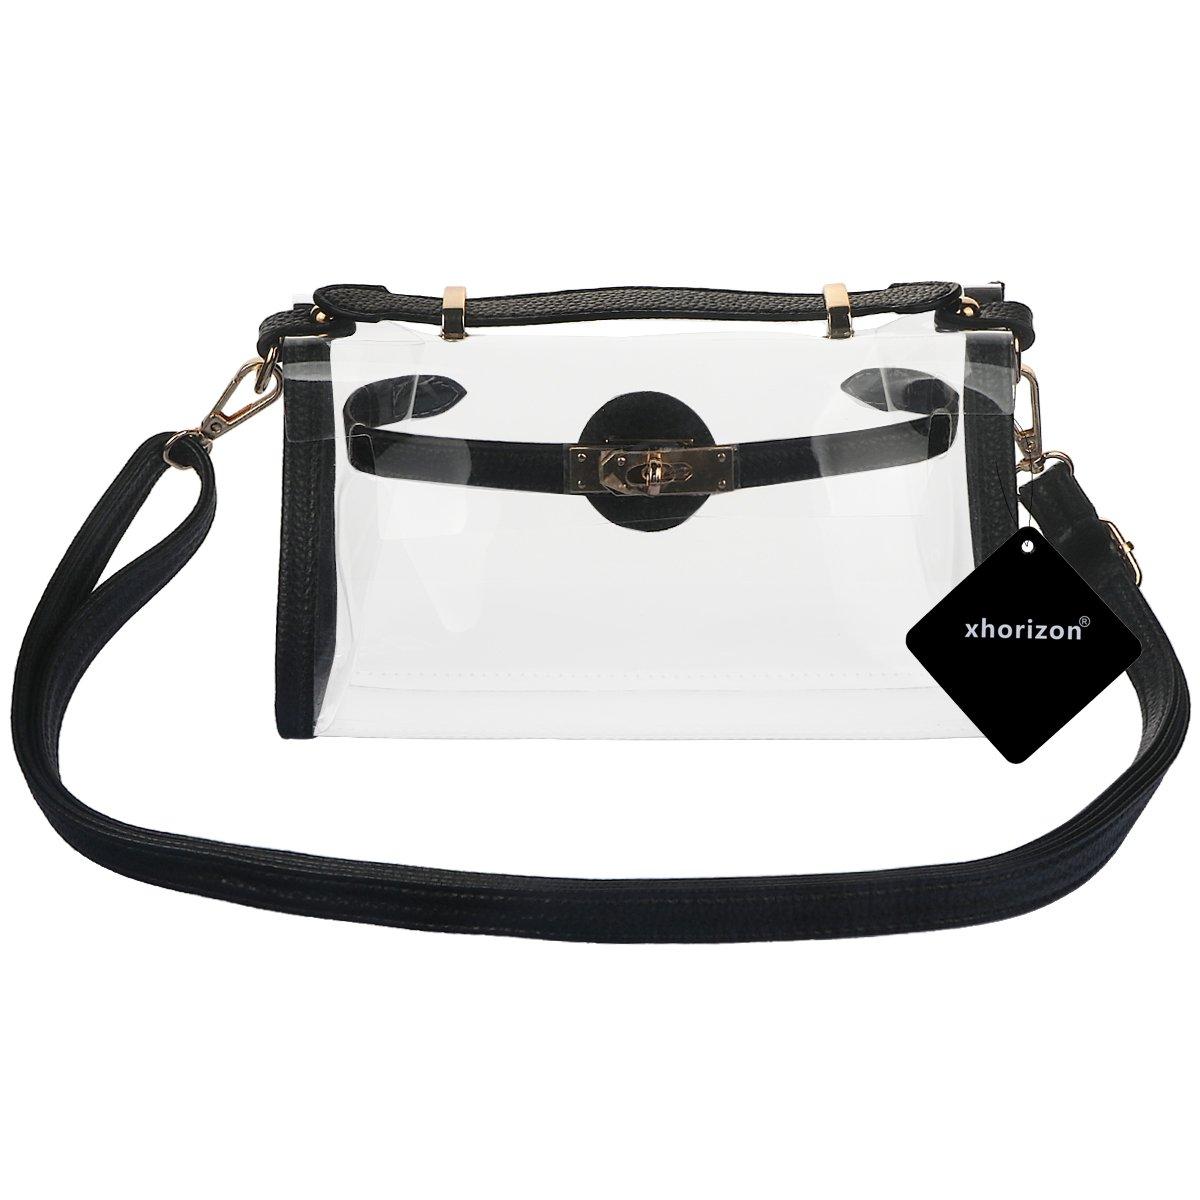 f1970b0c5e Get Quotations · xhorizon FL1 Clear Cross-Body Messenger Shoulder Bag